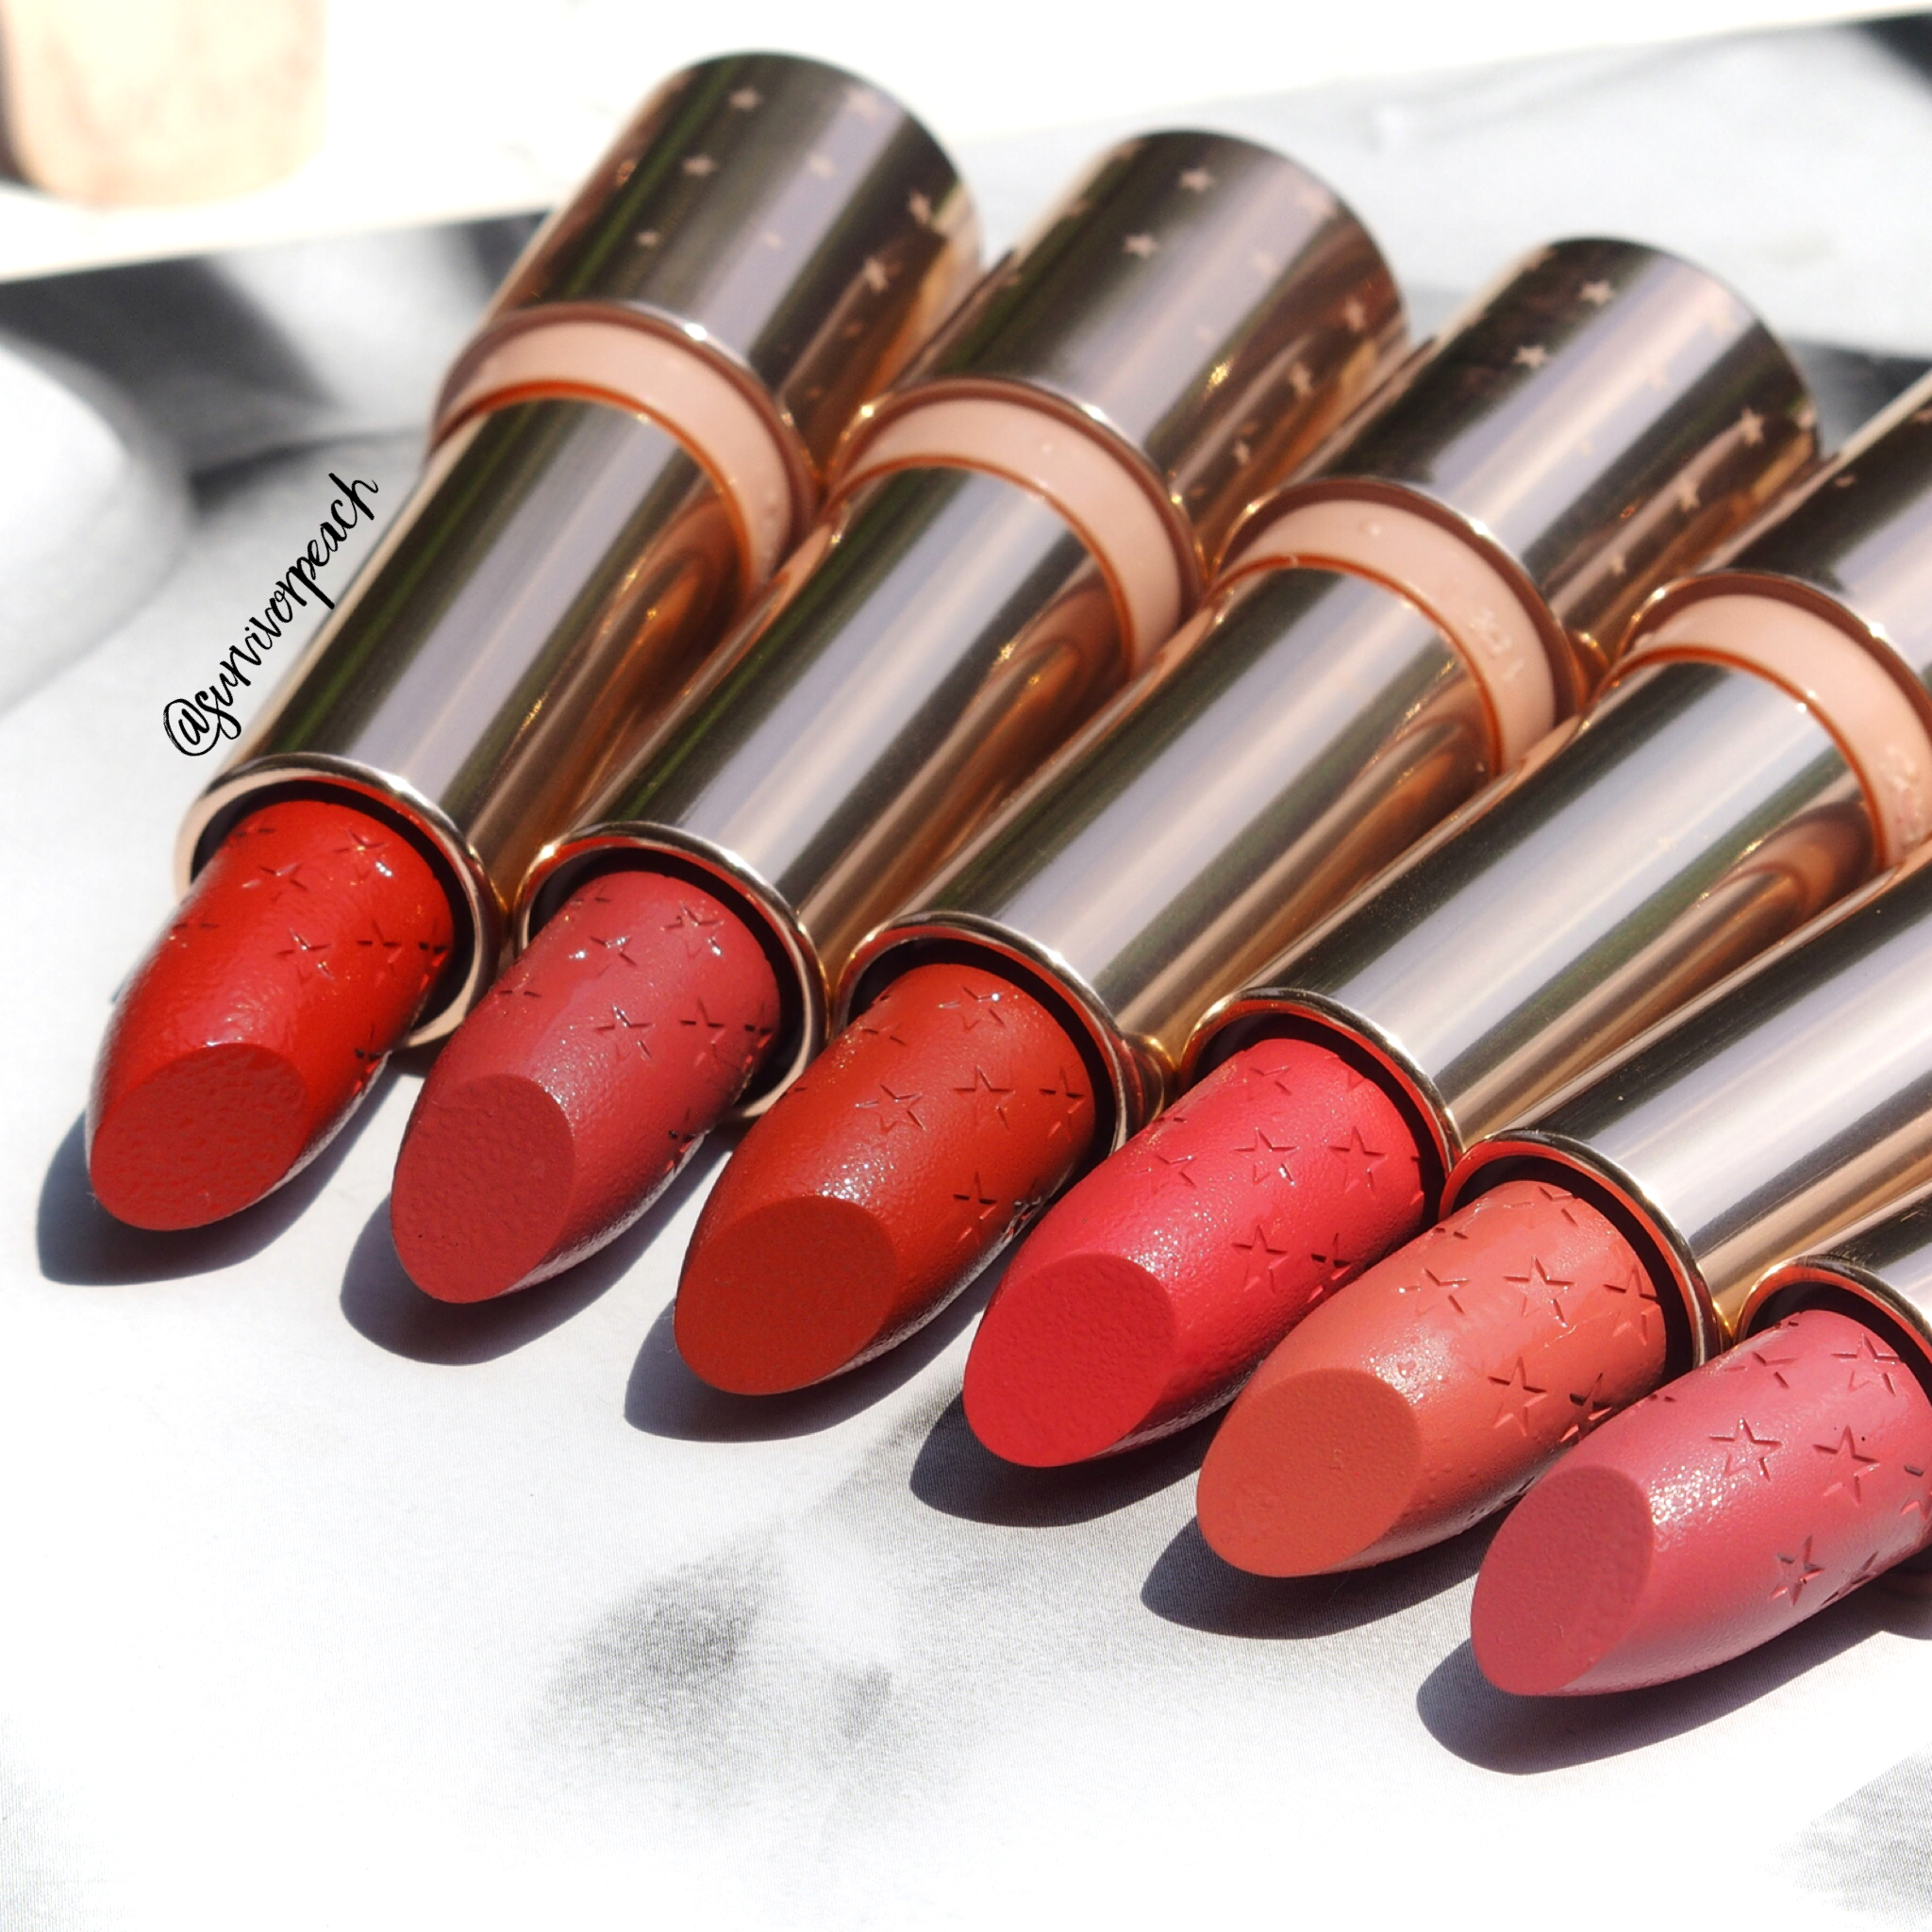 Colourpop Matte Lux lipsticks